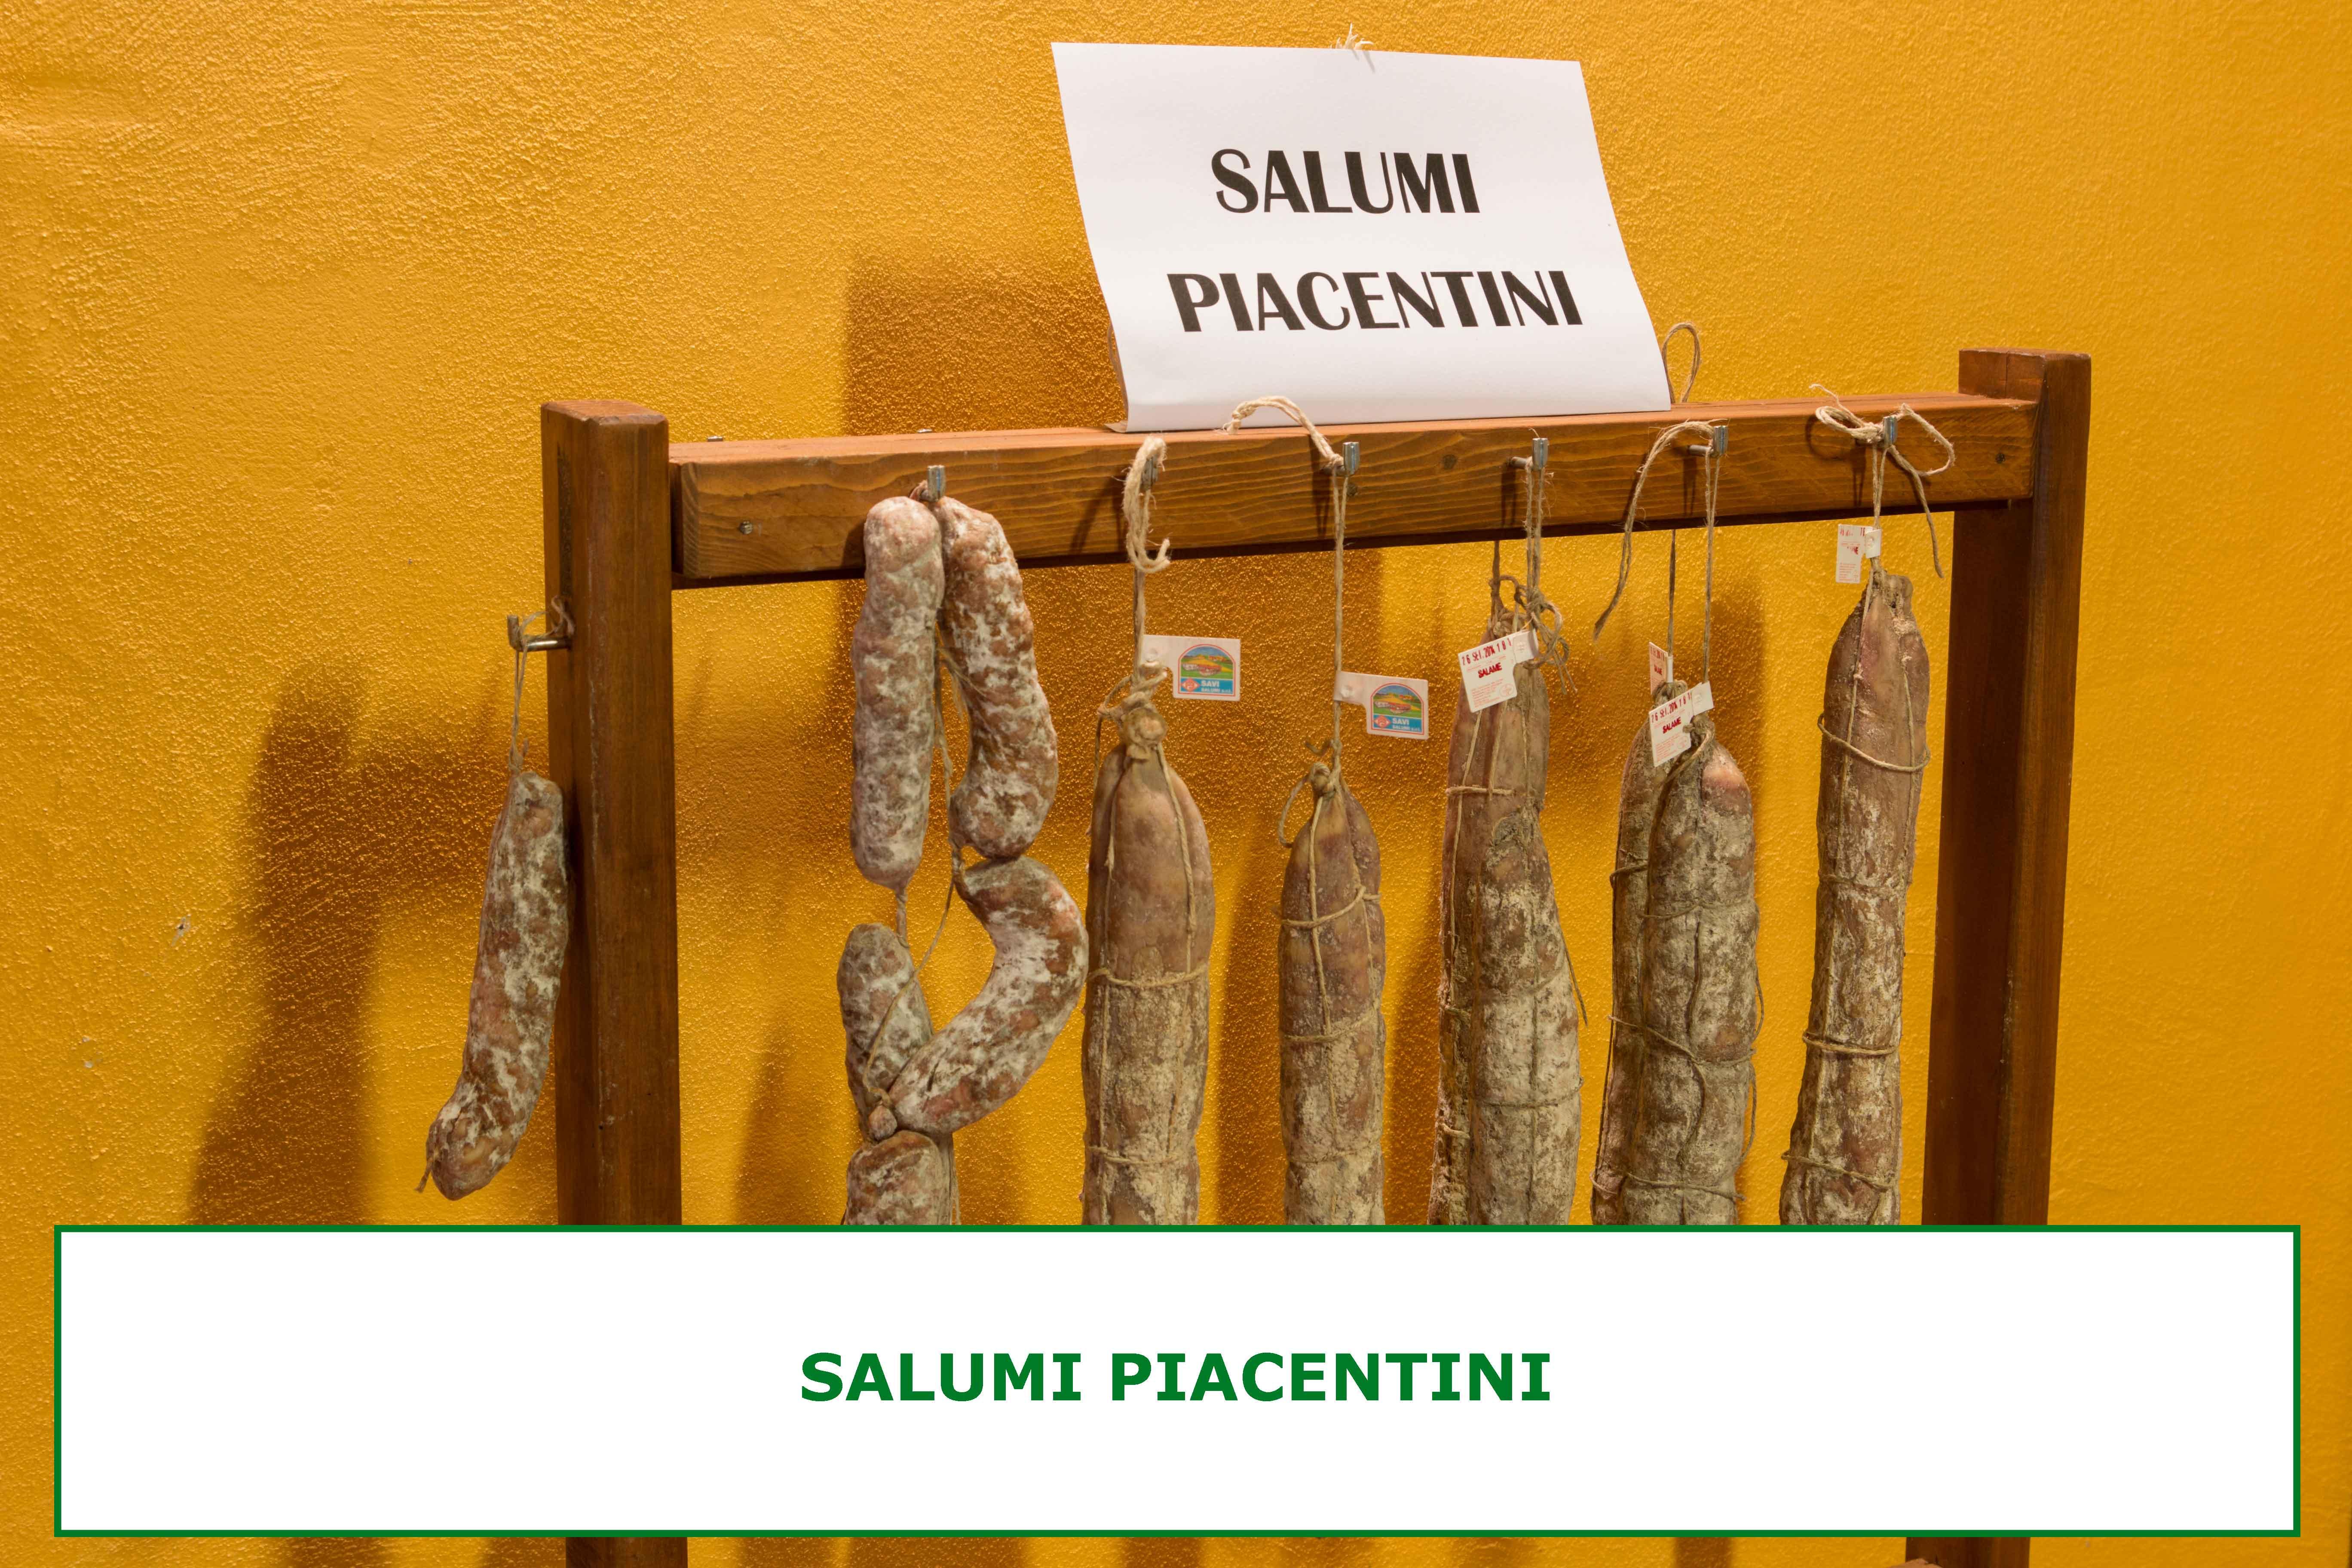 SALUMI-PIACENTINI